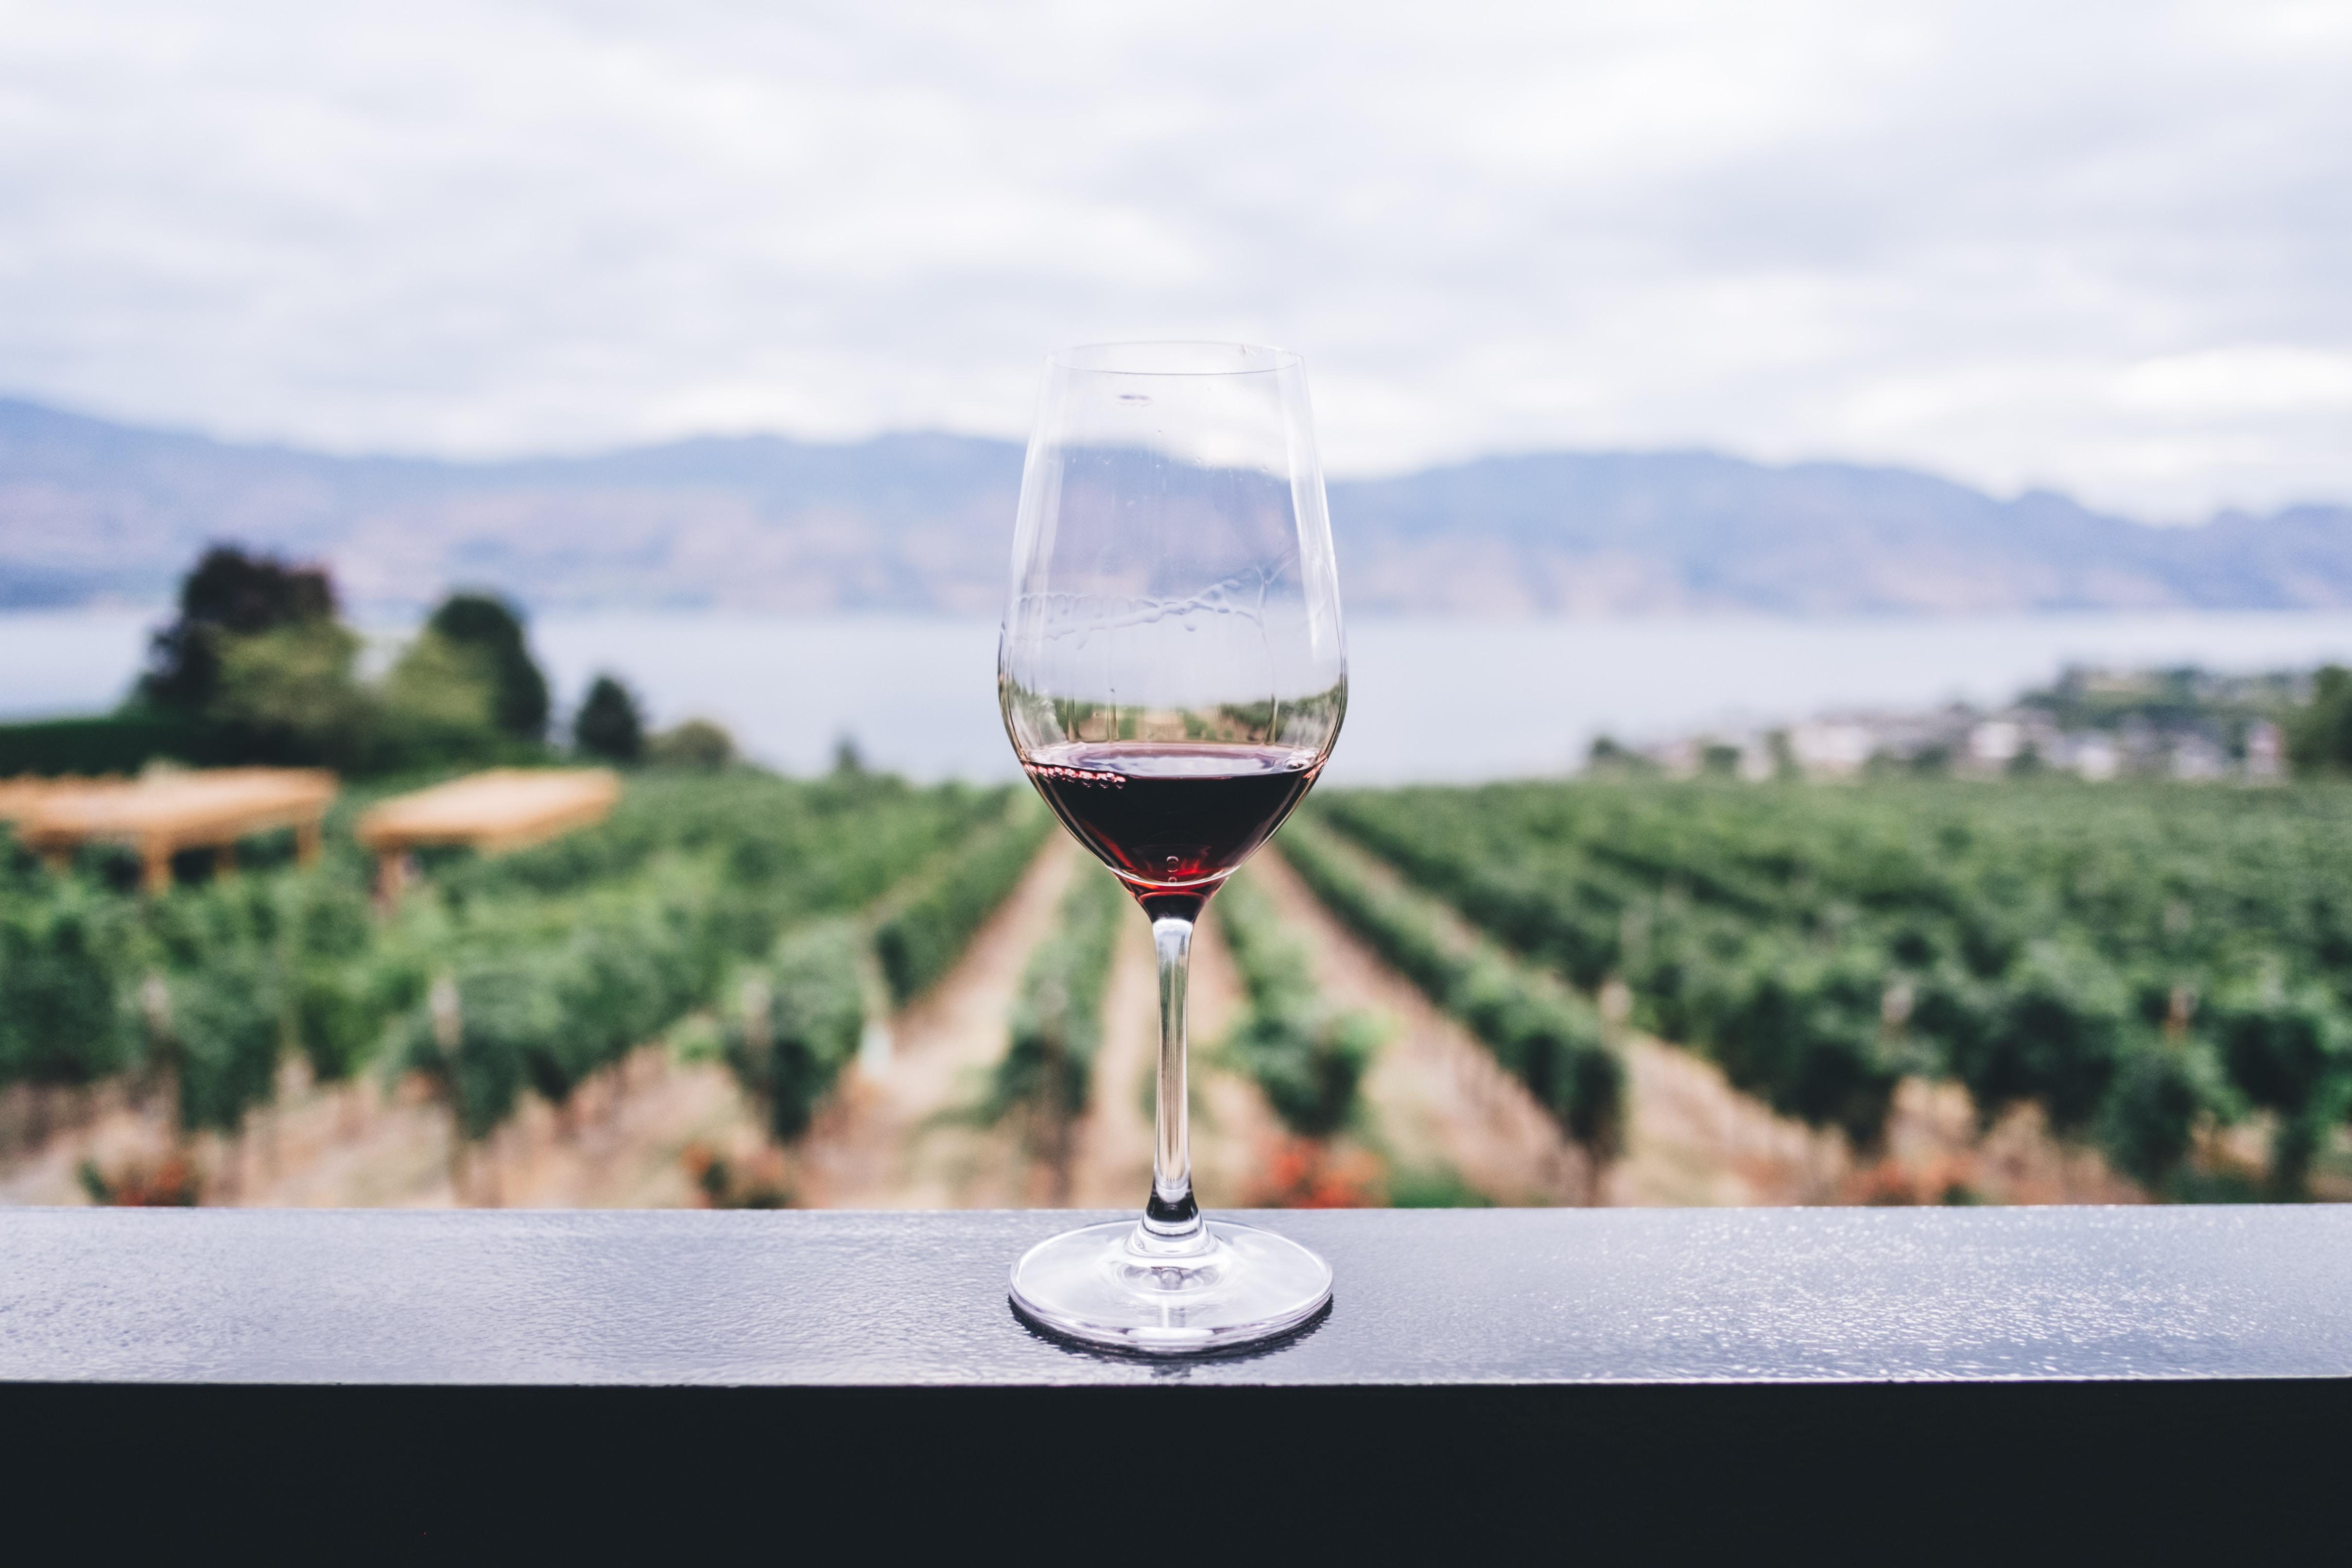 Data Mining: Wine Quality